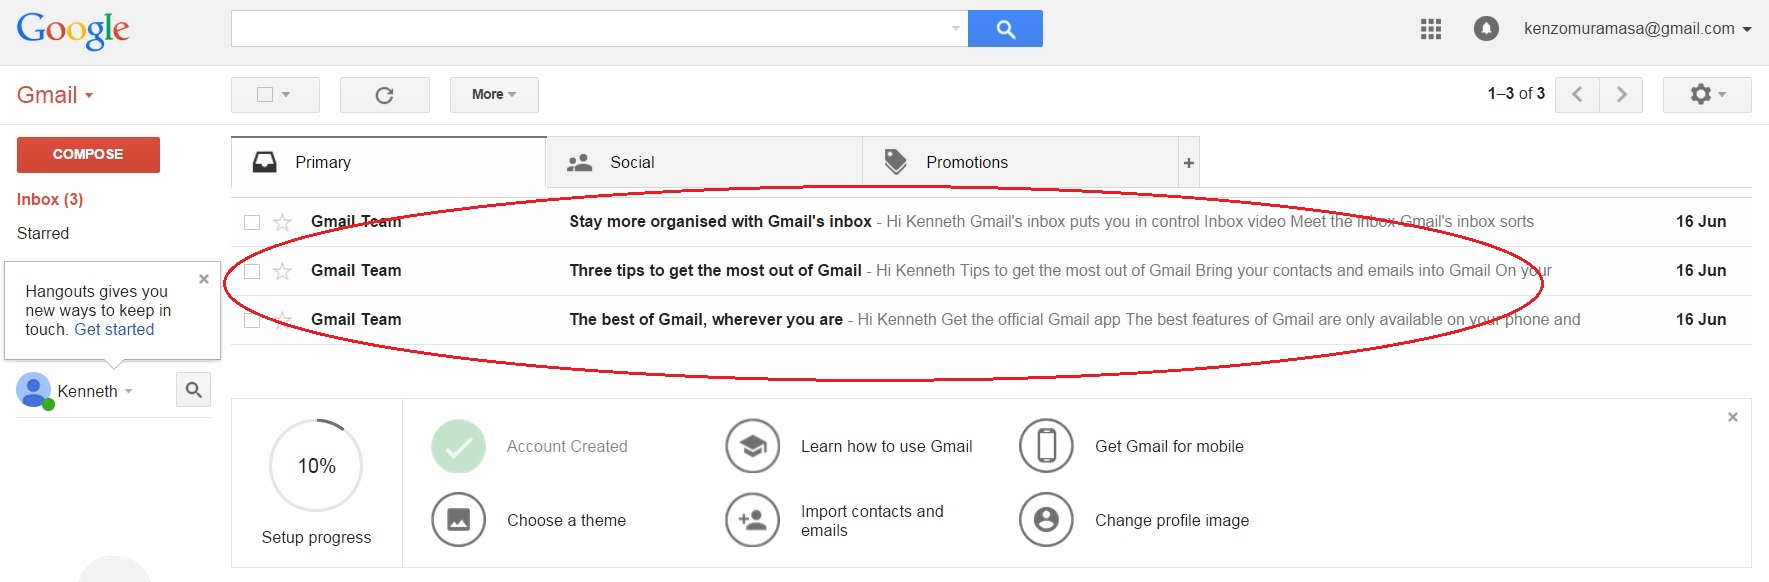 gmail homepage 1